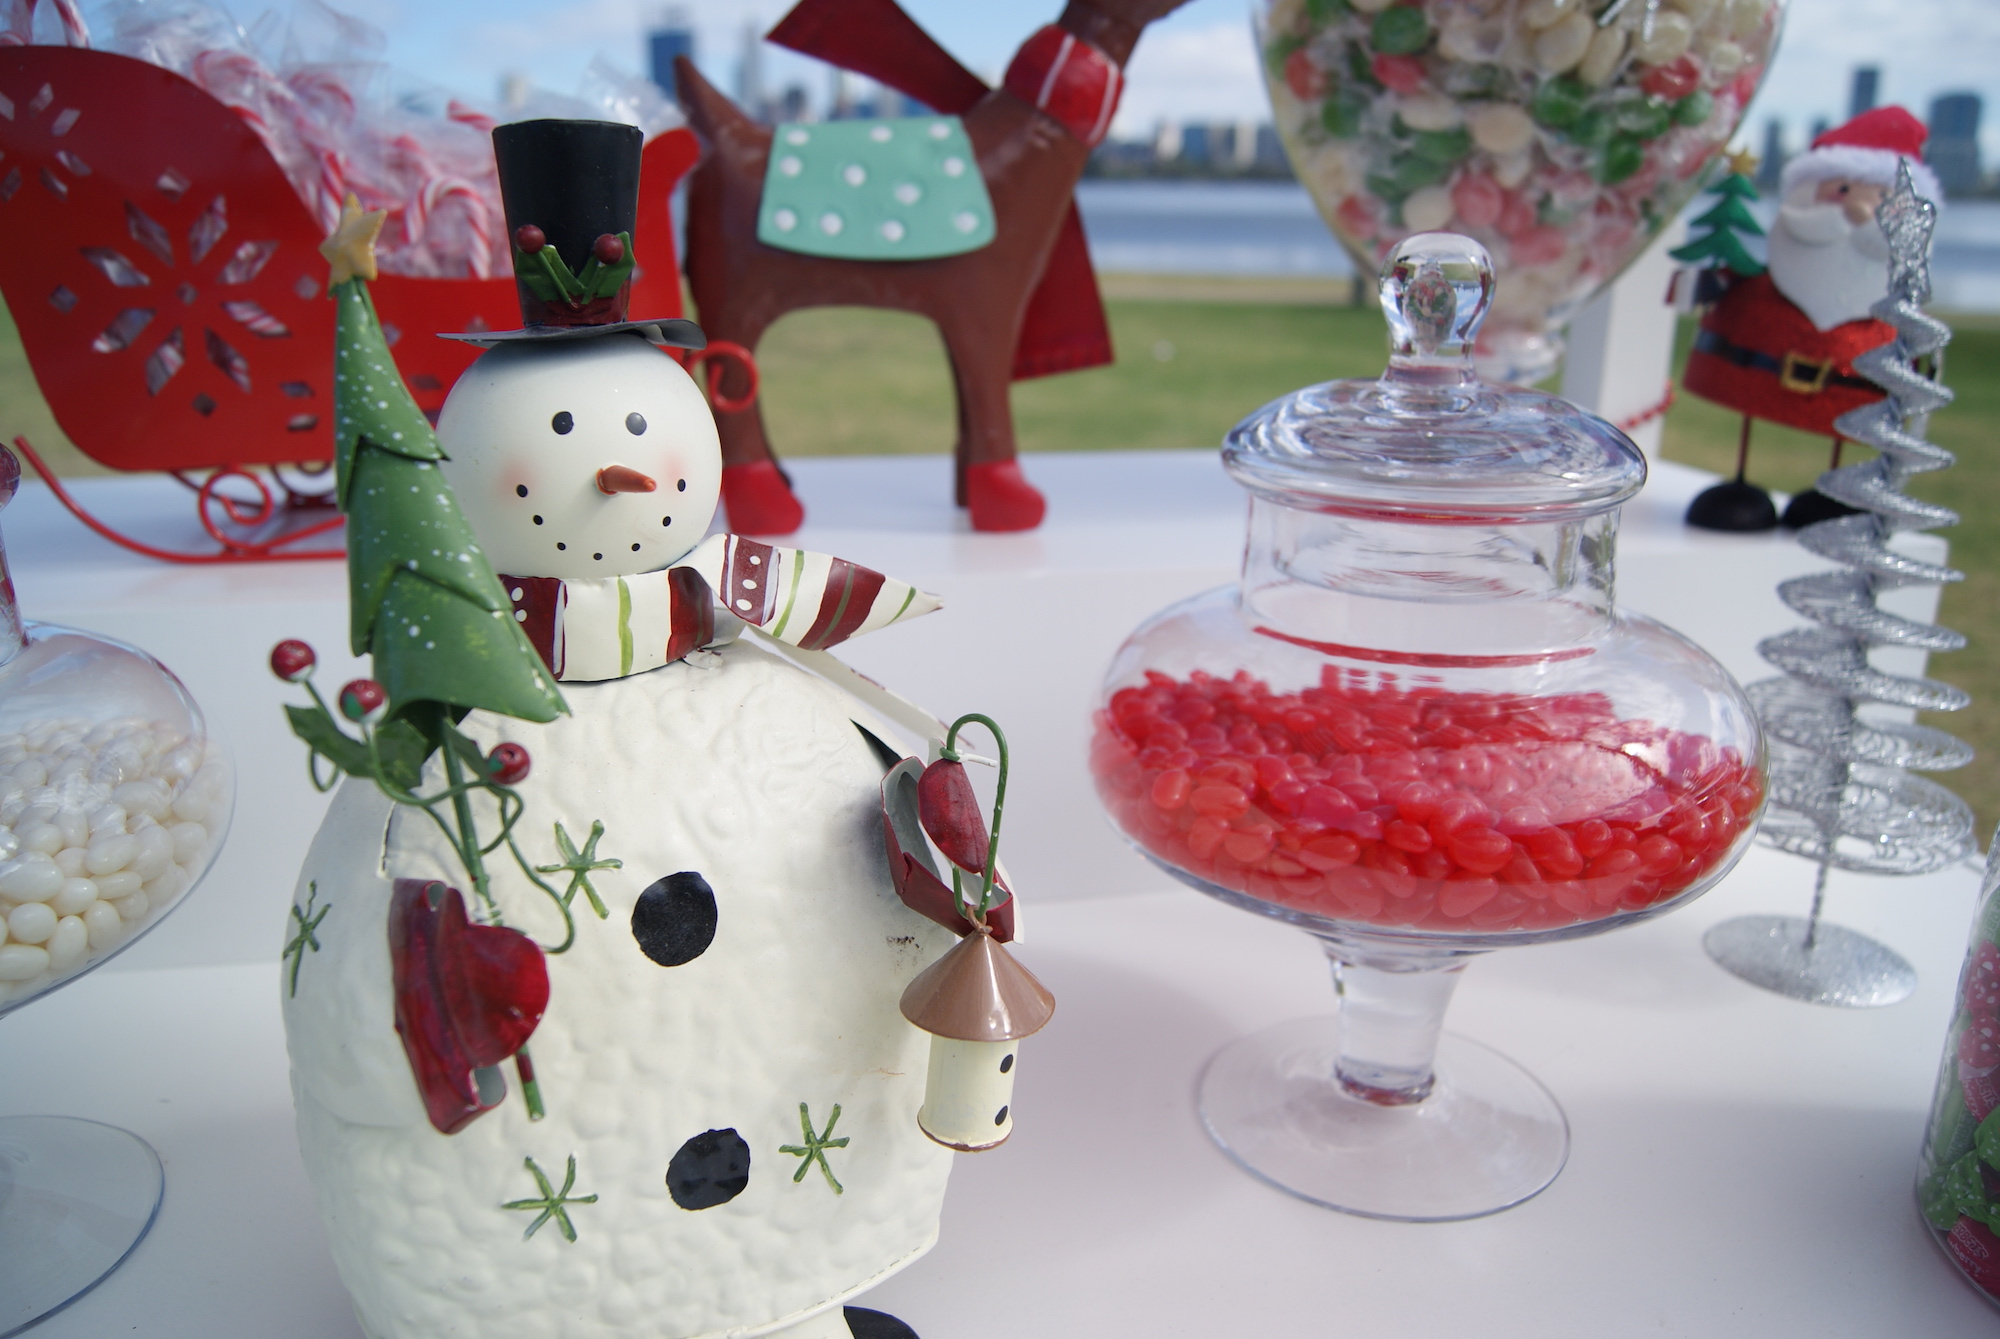 Snowman_and_Jelly_Beans_Little_Lolly_Cart_Christmas.JPG